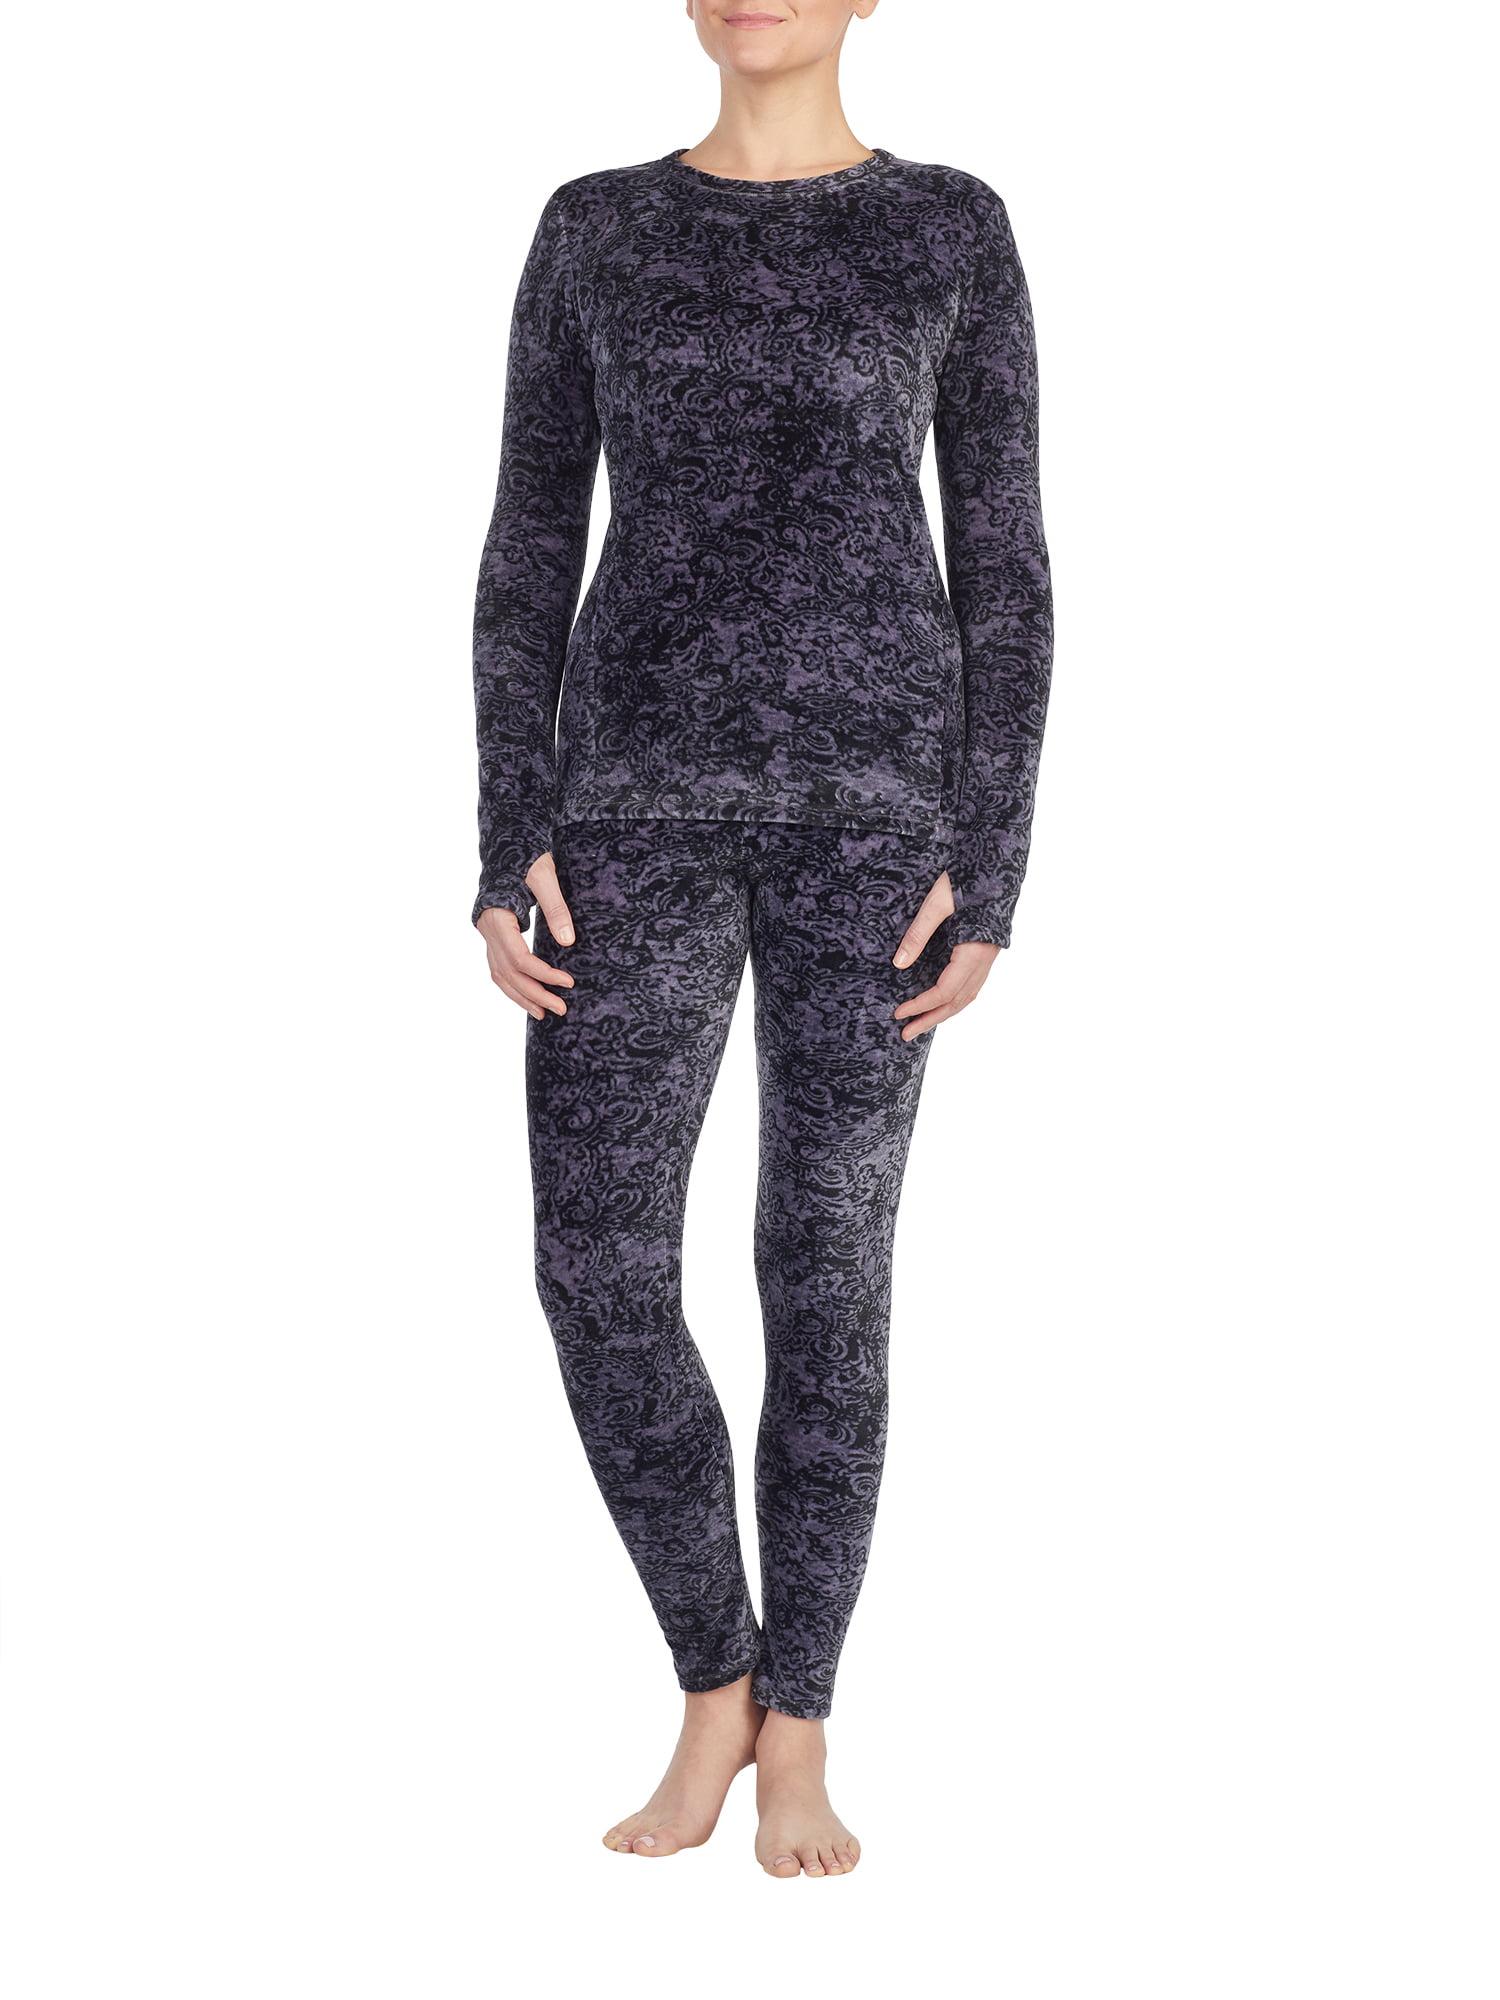 2992aecce912c4 ClimateRight by Cuddl Duds - Women's Strech Luxe Velour Warm Underwear  Legging - Walmart.com